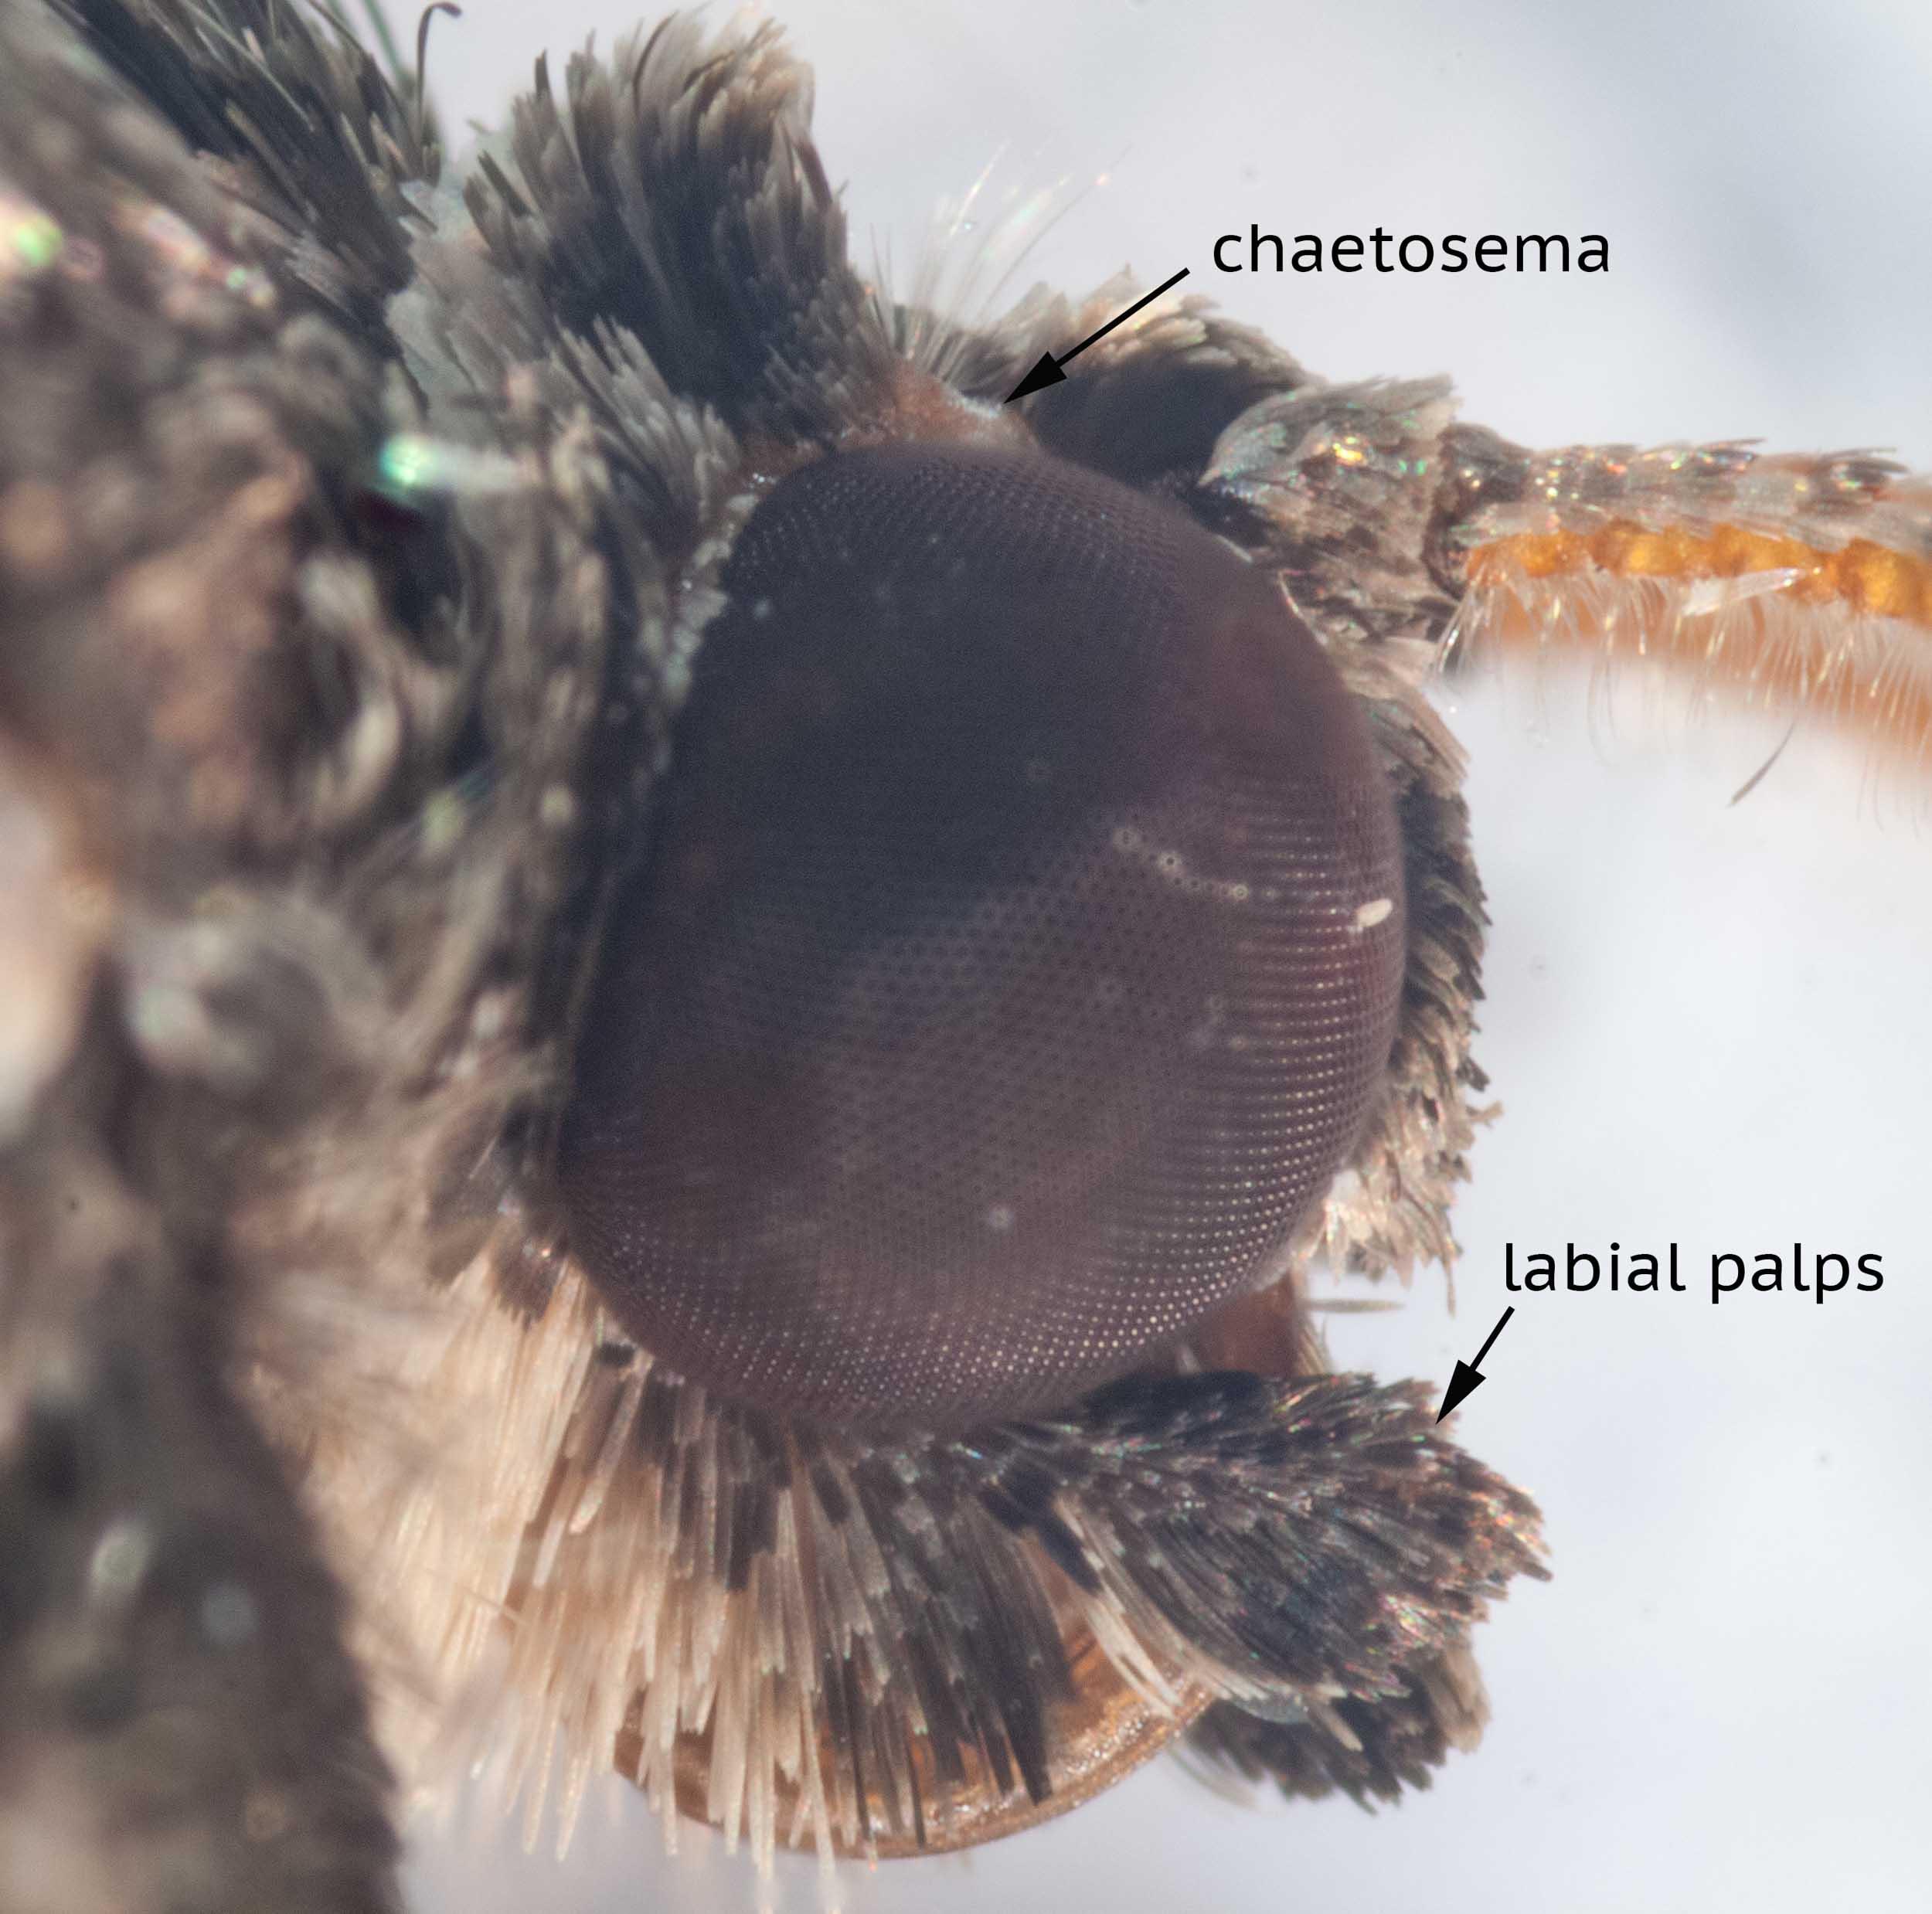 Family Geometridae